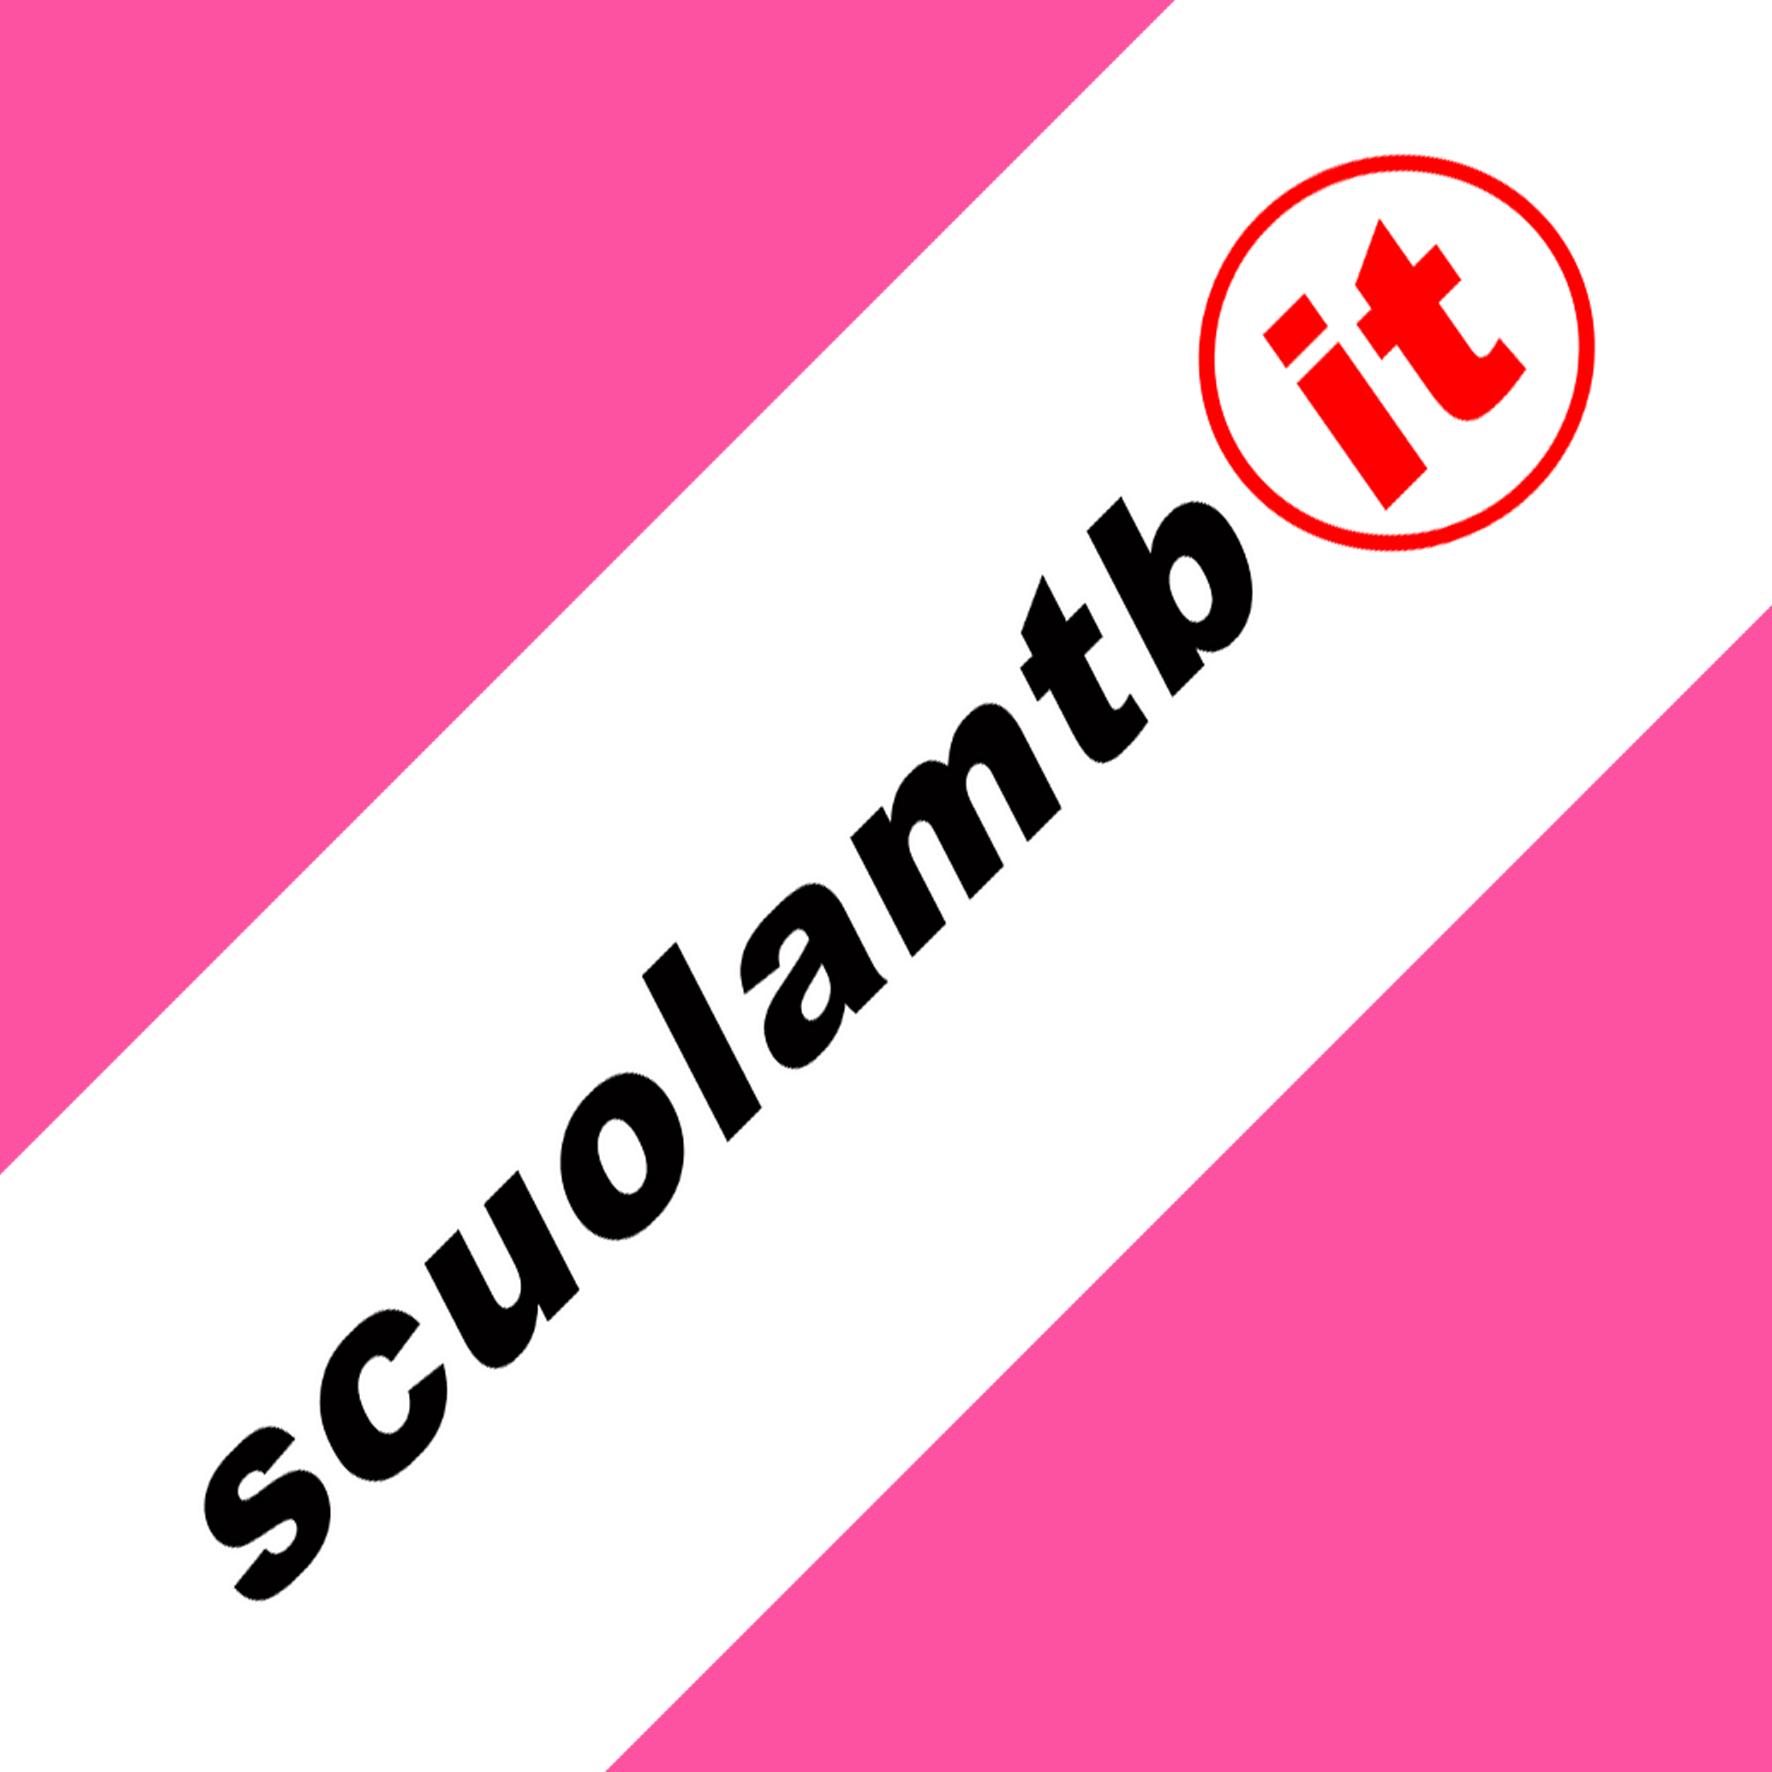 www.scuolamtb.it